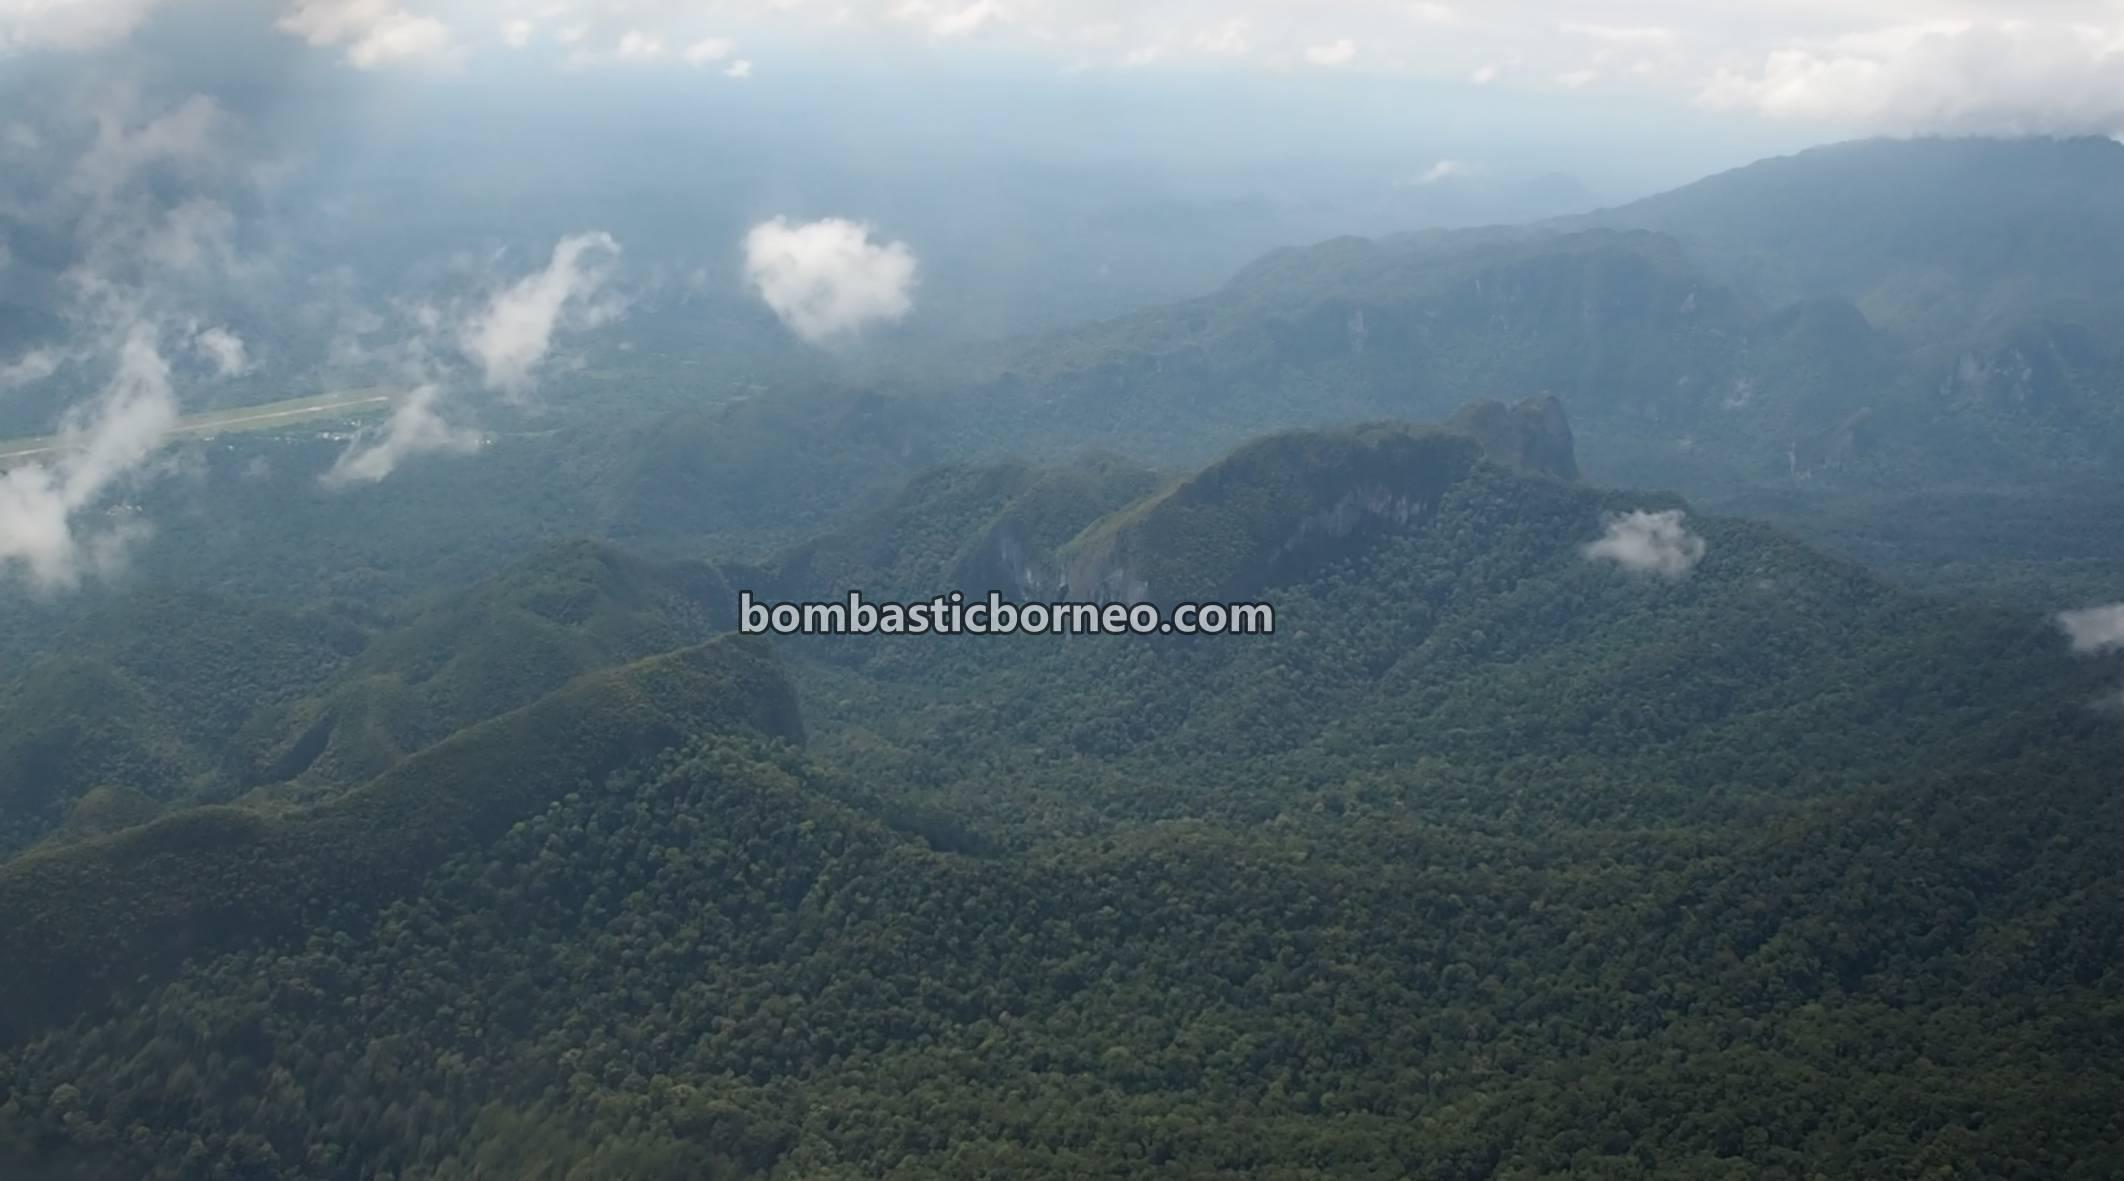 mas wings, twin otter, adventure, interior, exploration, Miri, Marudi, Bario Highlands, Malaysia, Sarawak, Tourism, tourist attraction, travel guide, Trans Border, Borneo